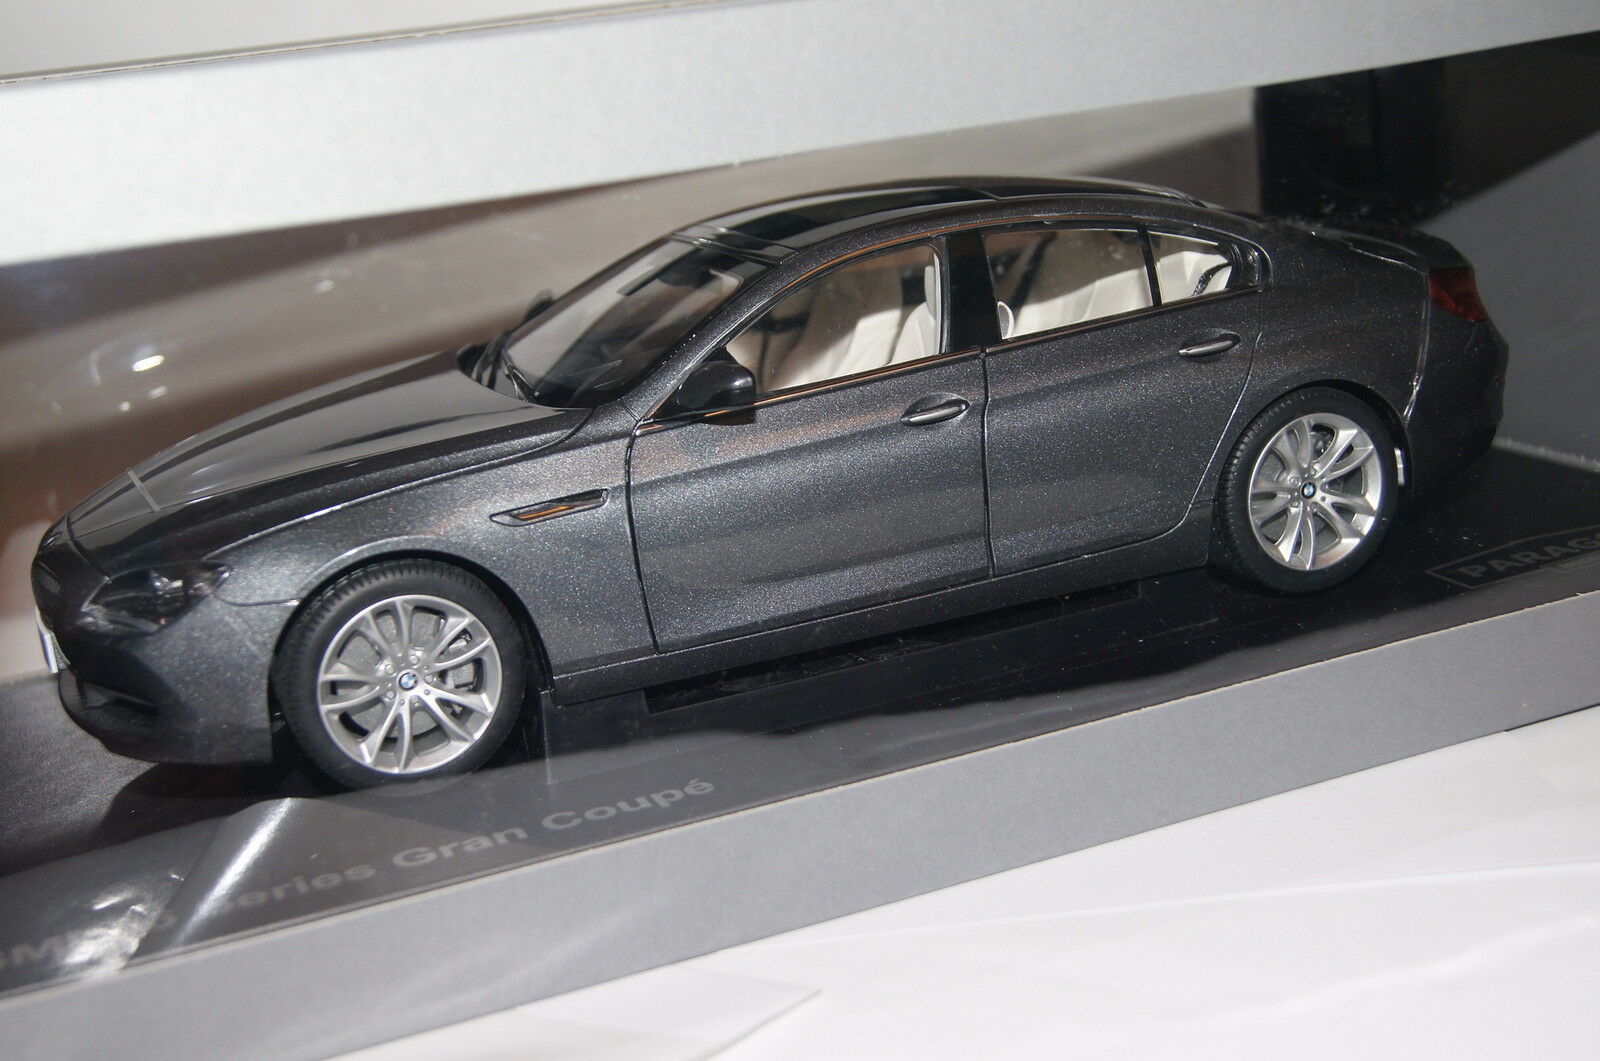 Bmw 6er gran coupé f06 2013 Space gris 1 18 Paragon nuevo & OVP 97031